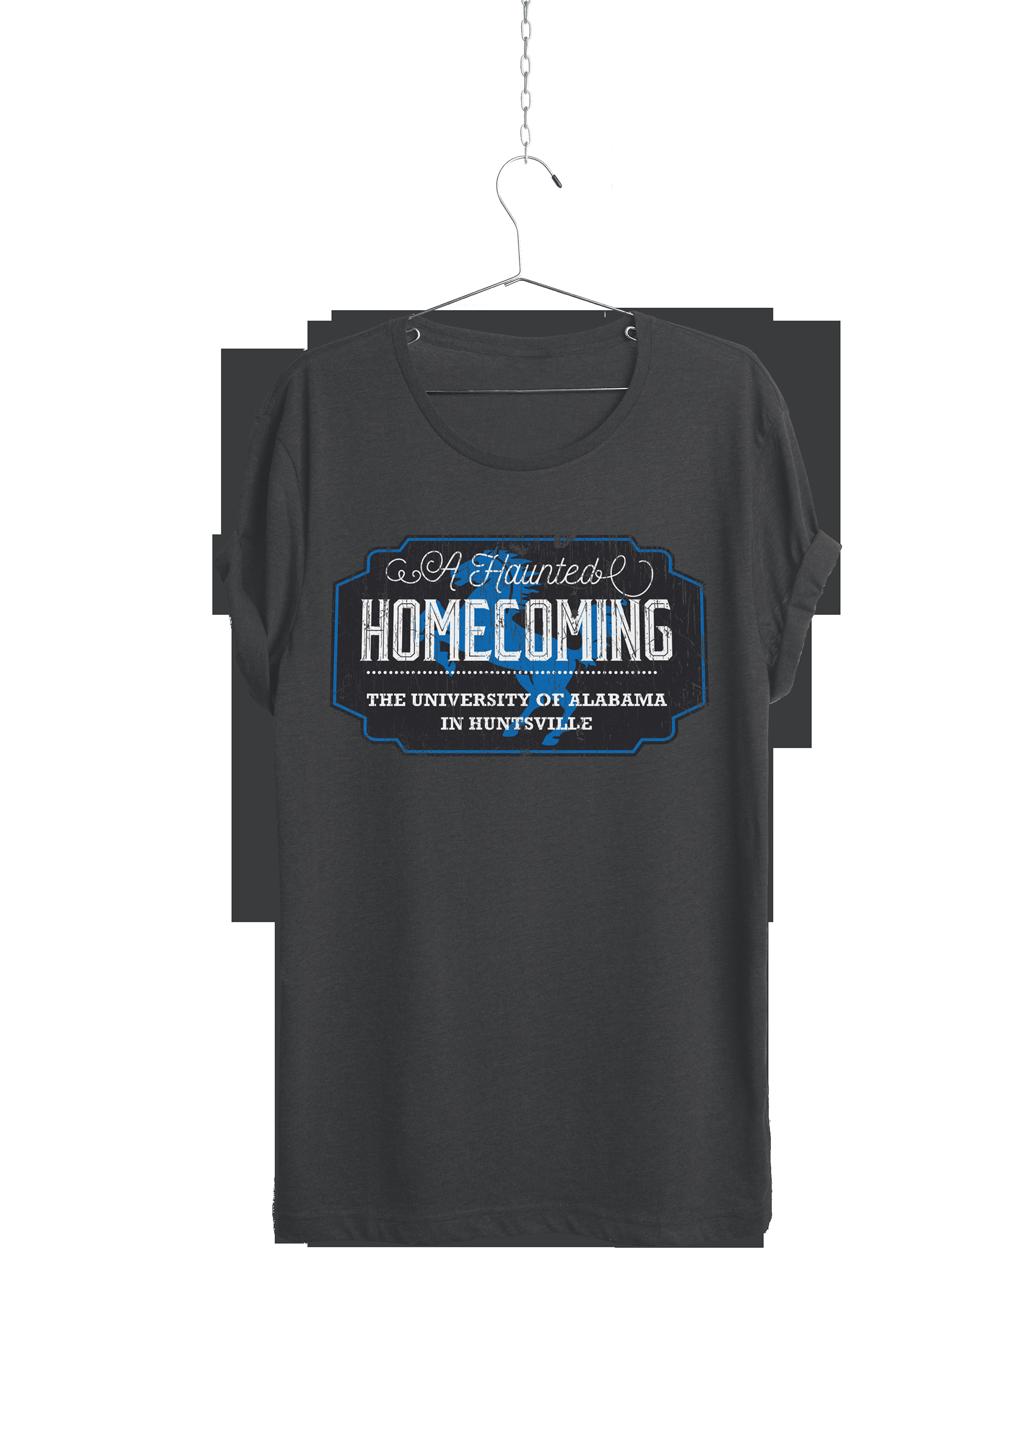 Homecoming Custom Tshirt Design Awesome Custom T Shirts For Campus